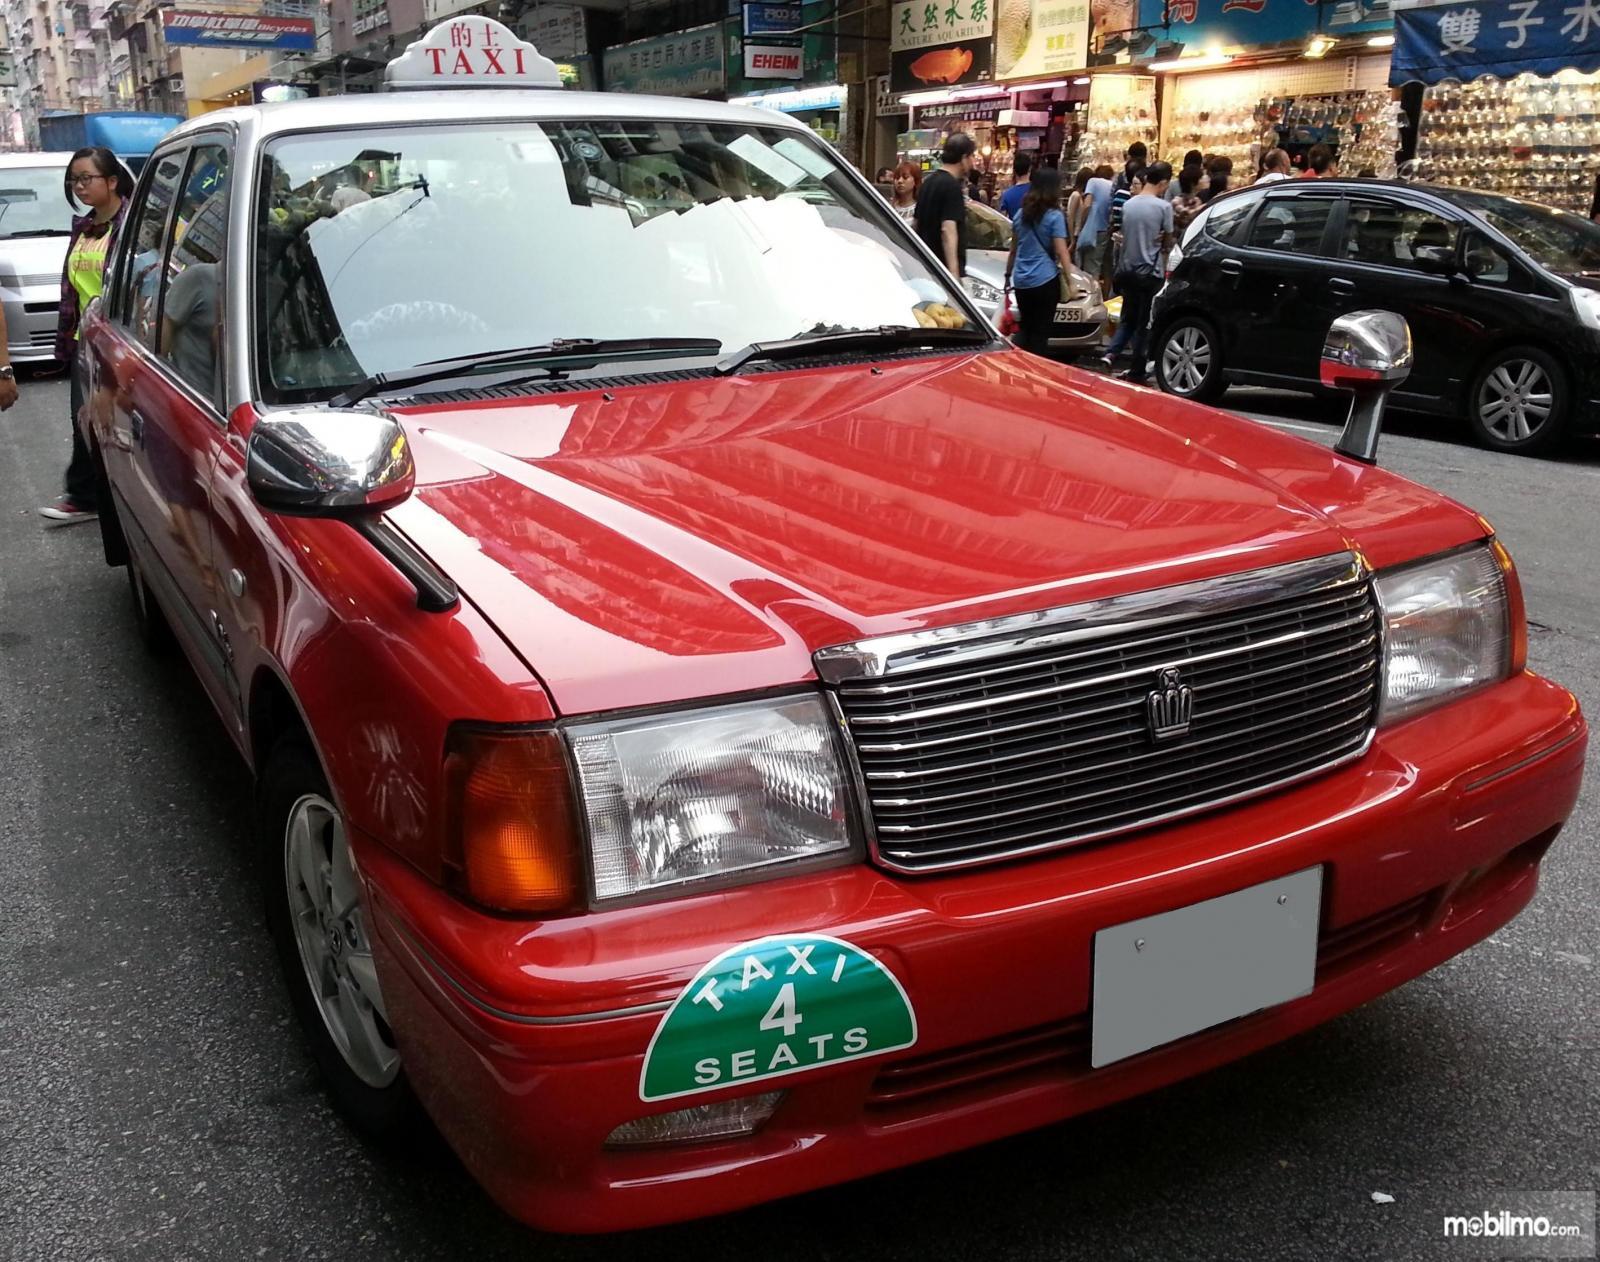 Foto taksi Toyota Crown Comfort dengan spion fender